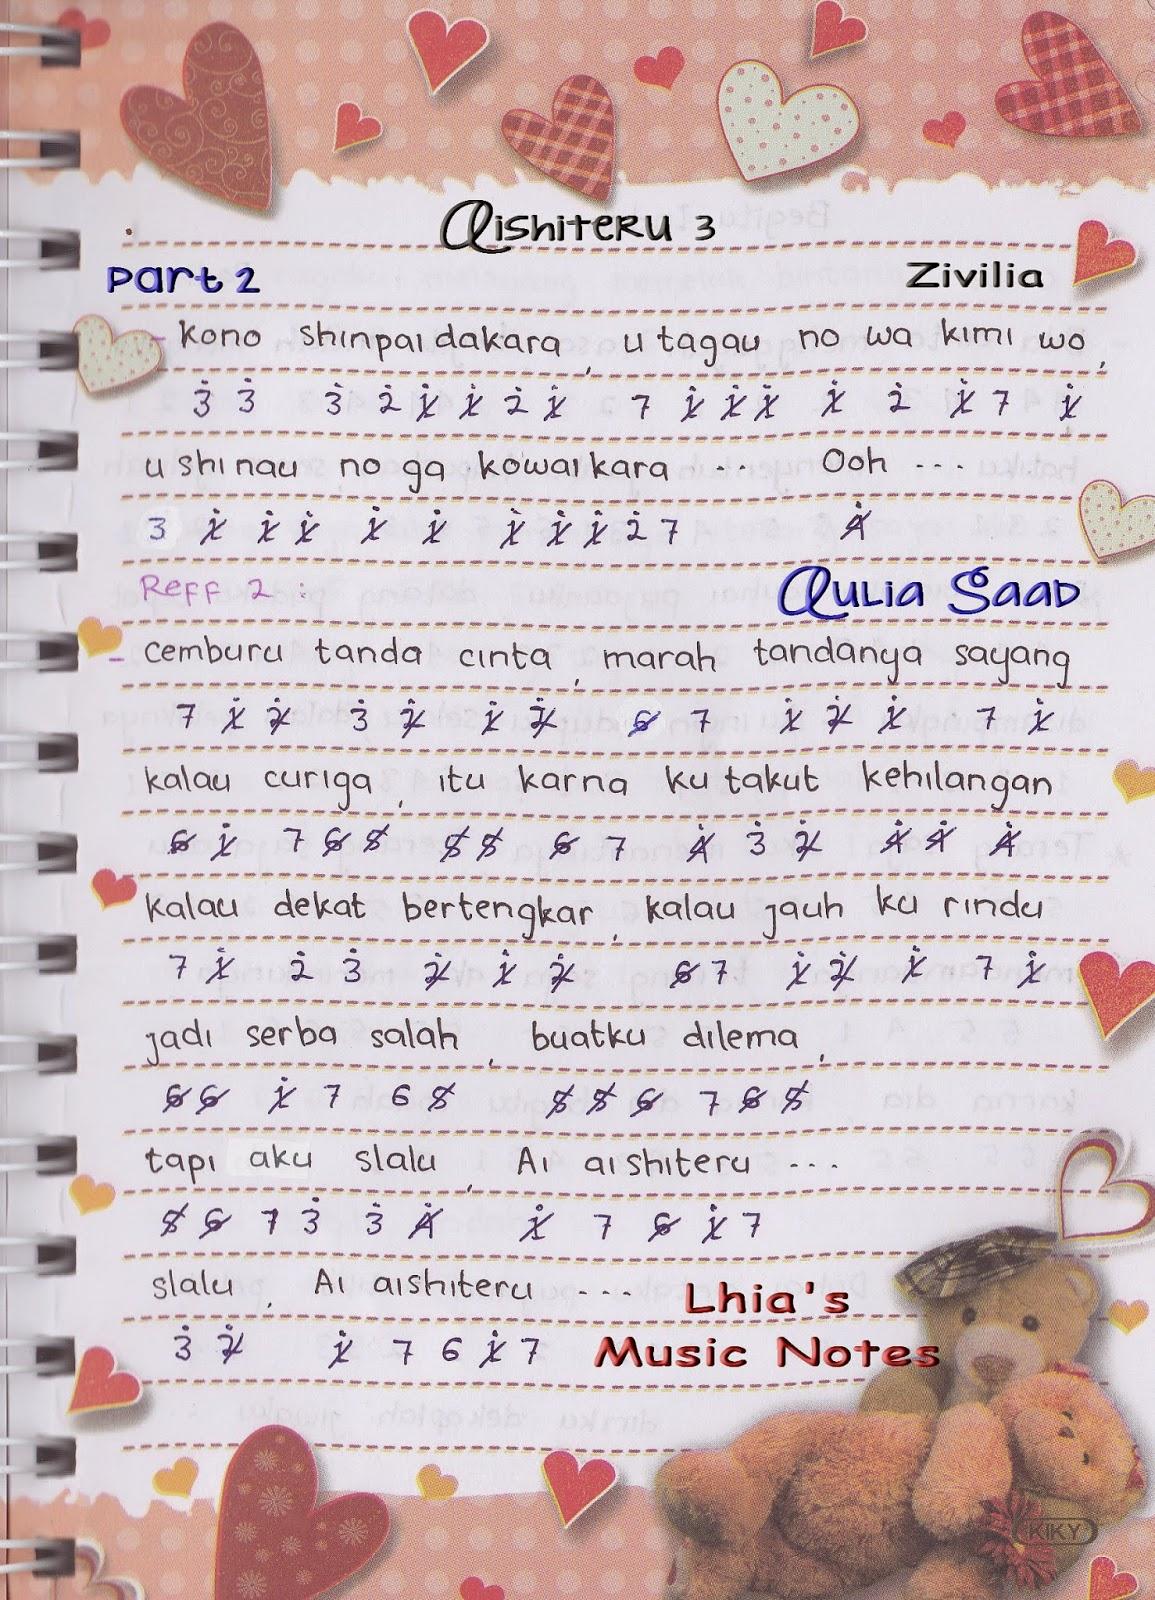 Lirik Lagu Aishiteru 3 : lirik, aishiteru, Angka, Pianika, Zivilia, Aishiteru, Lhia's, Music, Notes